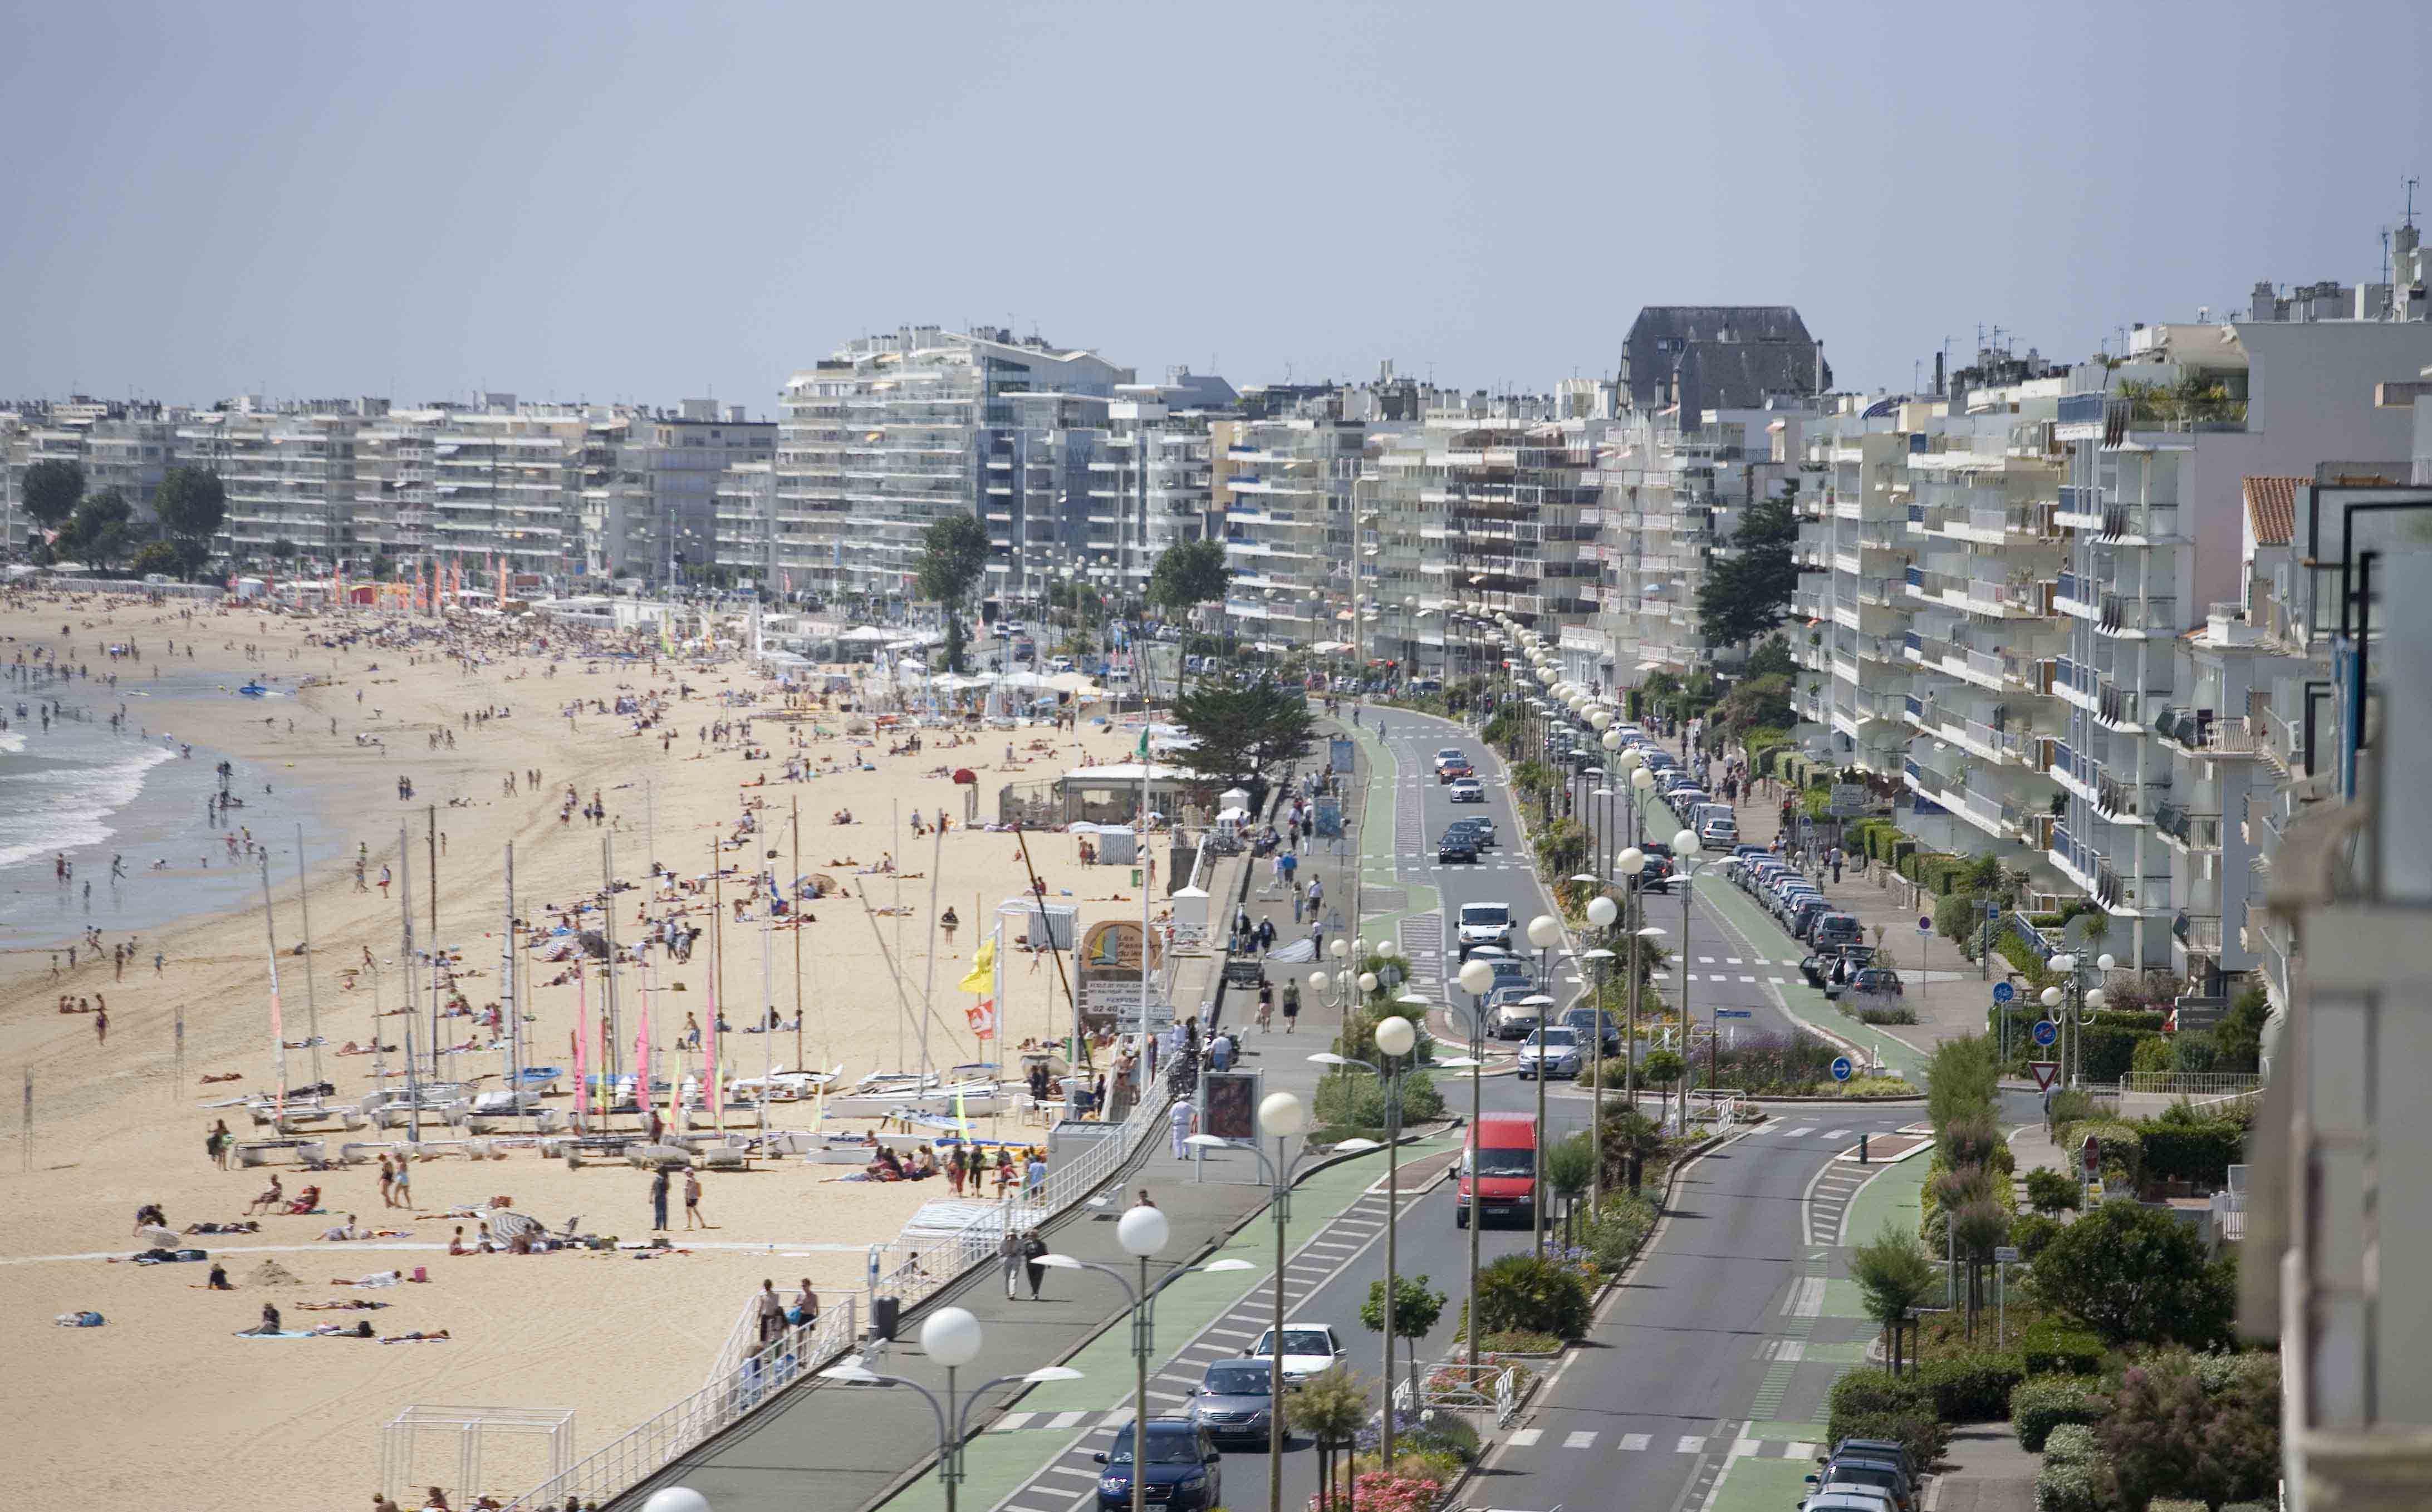 La Baule France  city images : Promenade in the resort of La Baule, France wallpapers and images ...